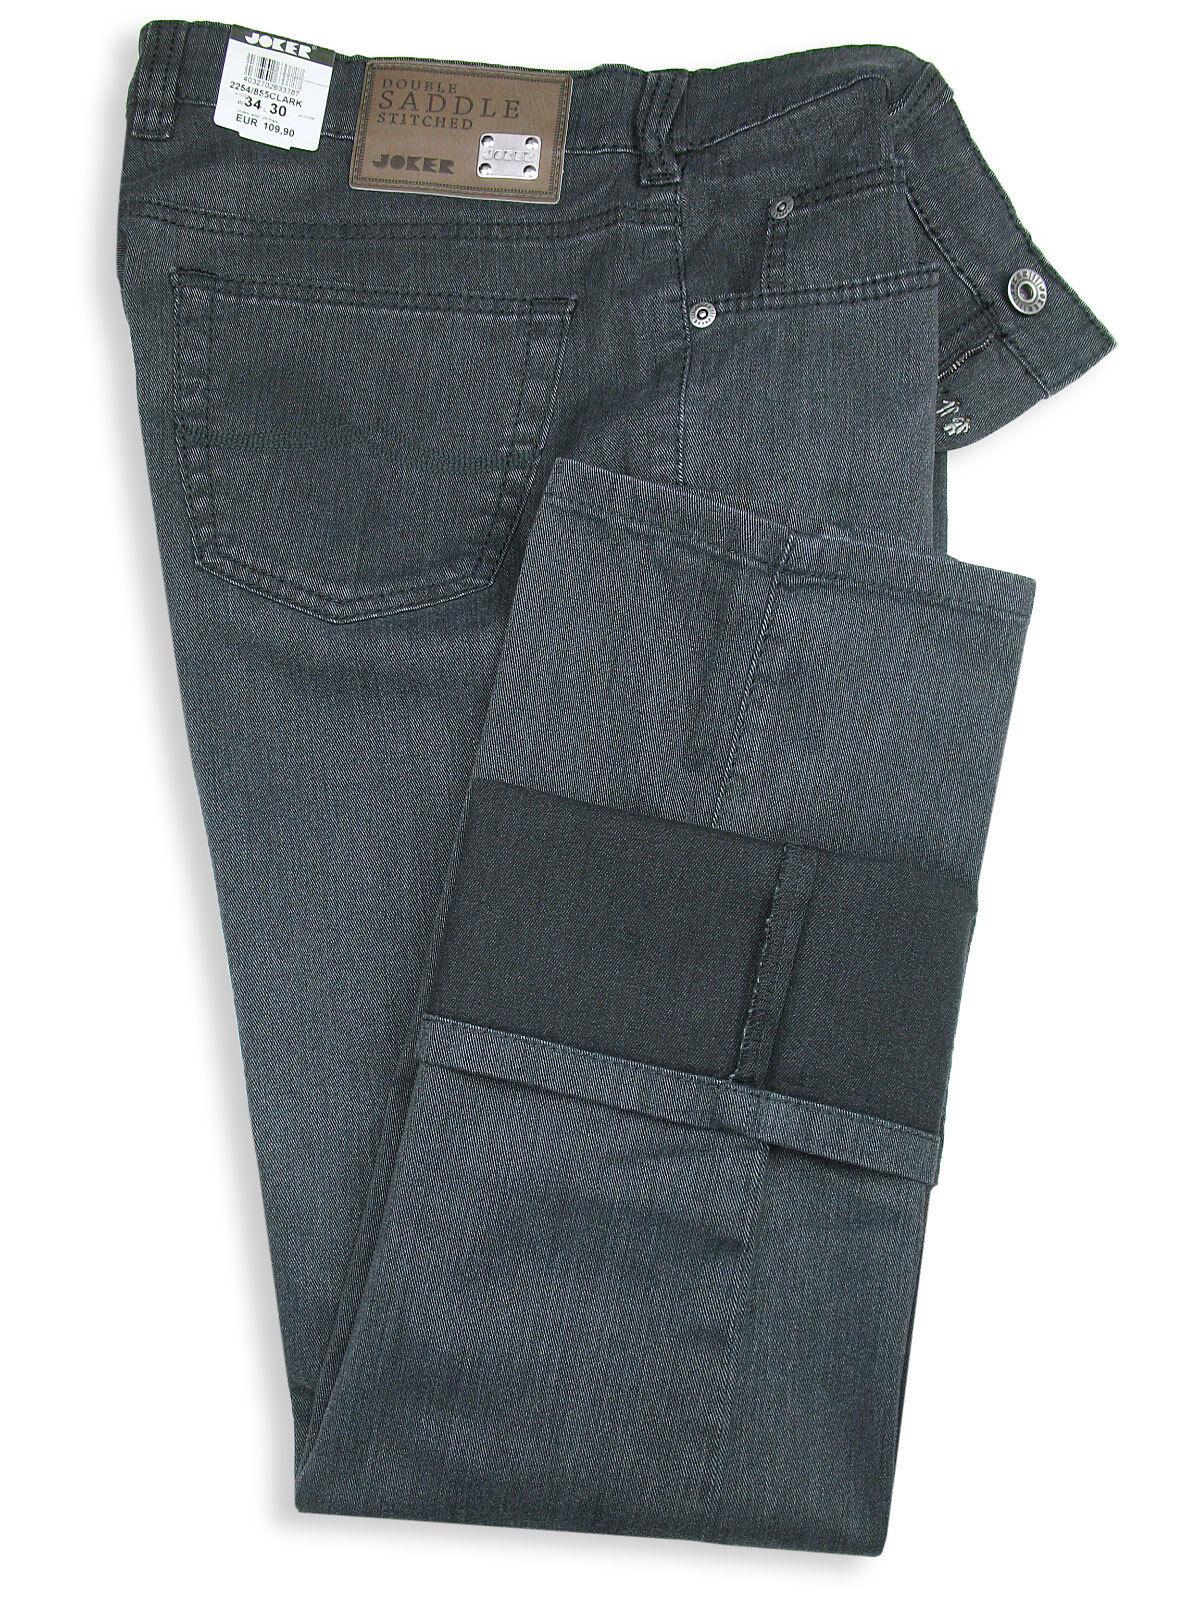 Joker Jeans Clark (Comfort Fit) 2254 855 Dark Grey Dark Grey Stretch